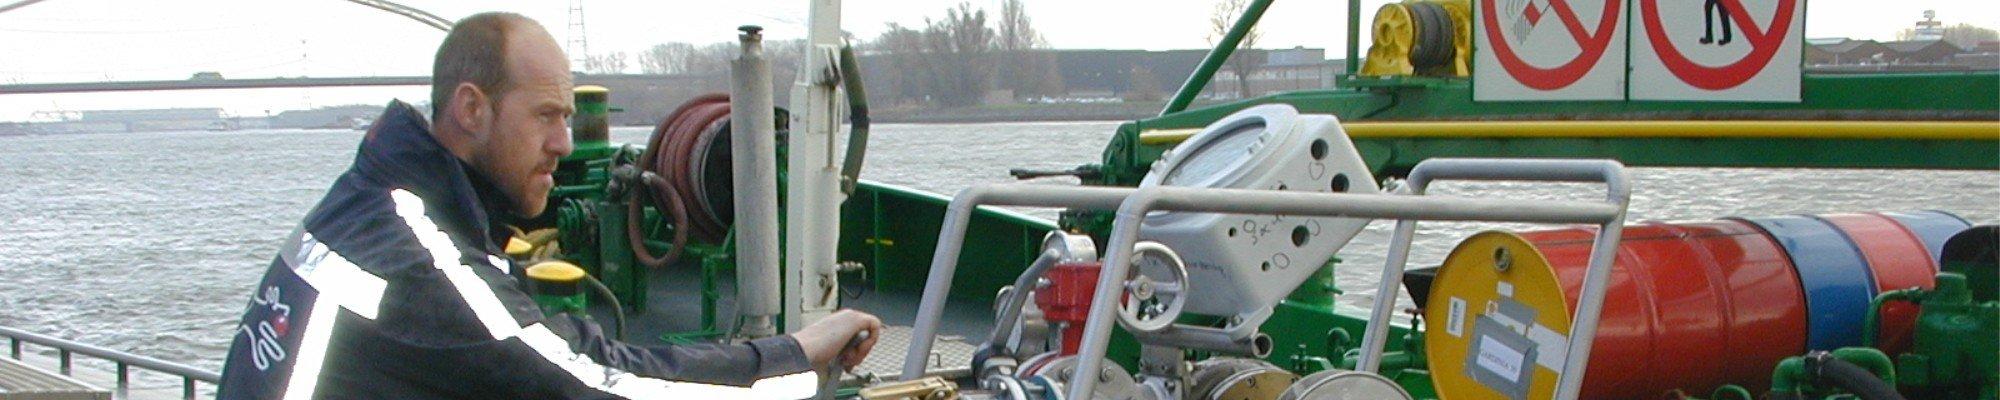 Kalibratie scheepvaart - ODS web page header